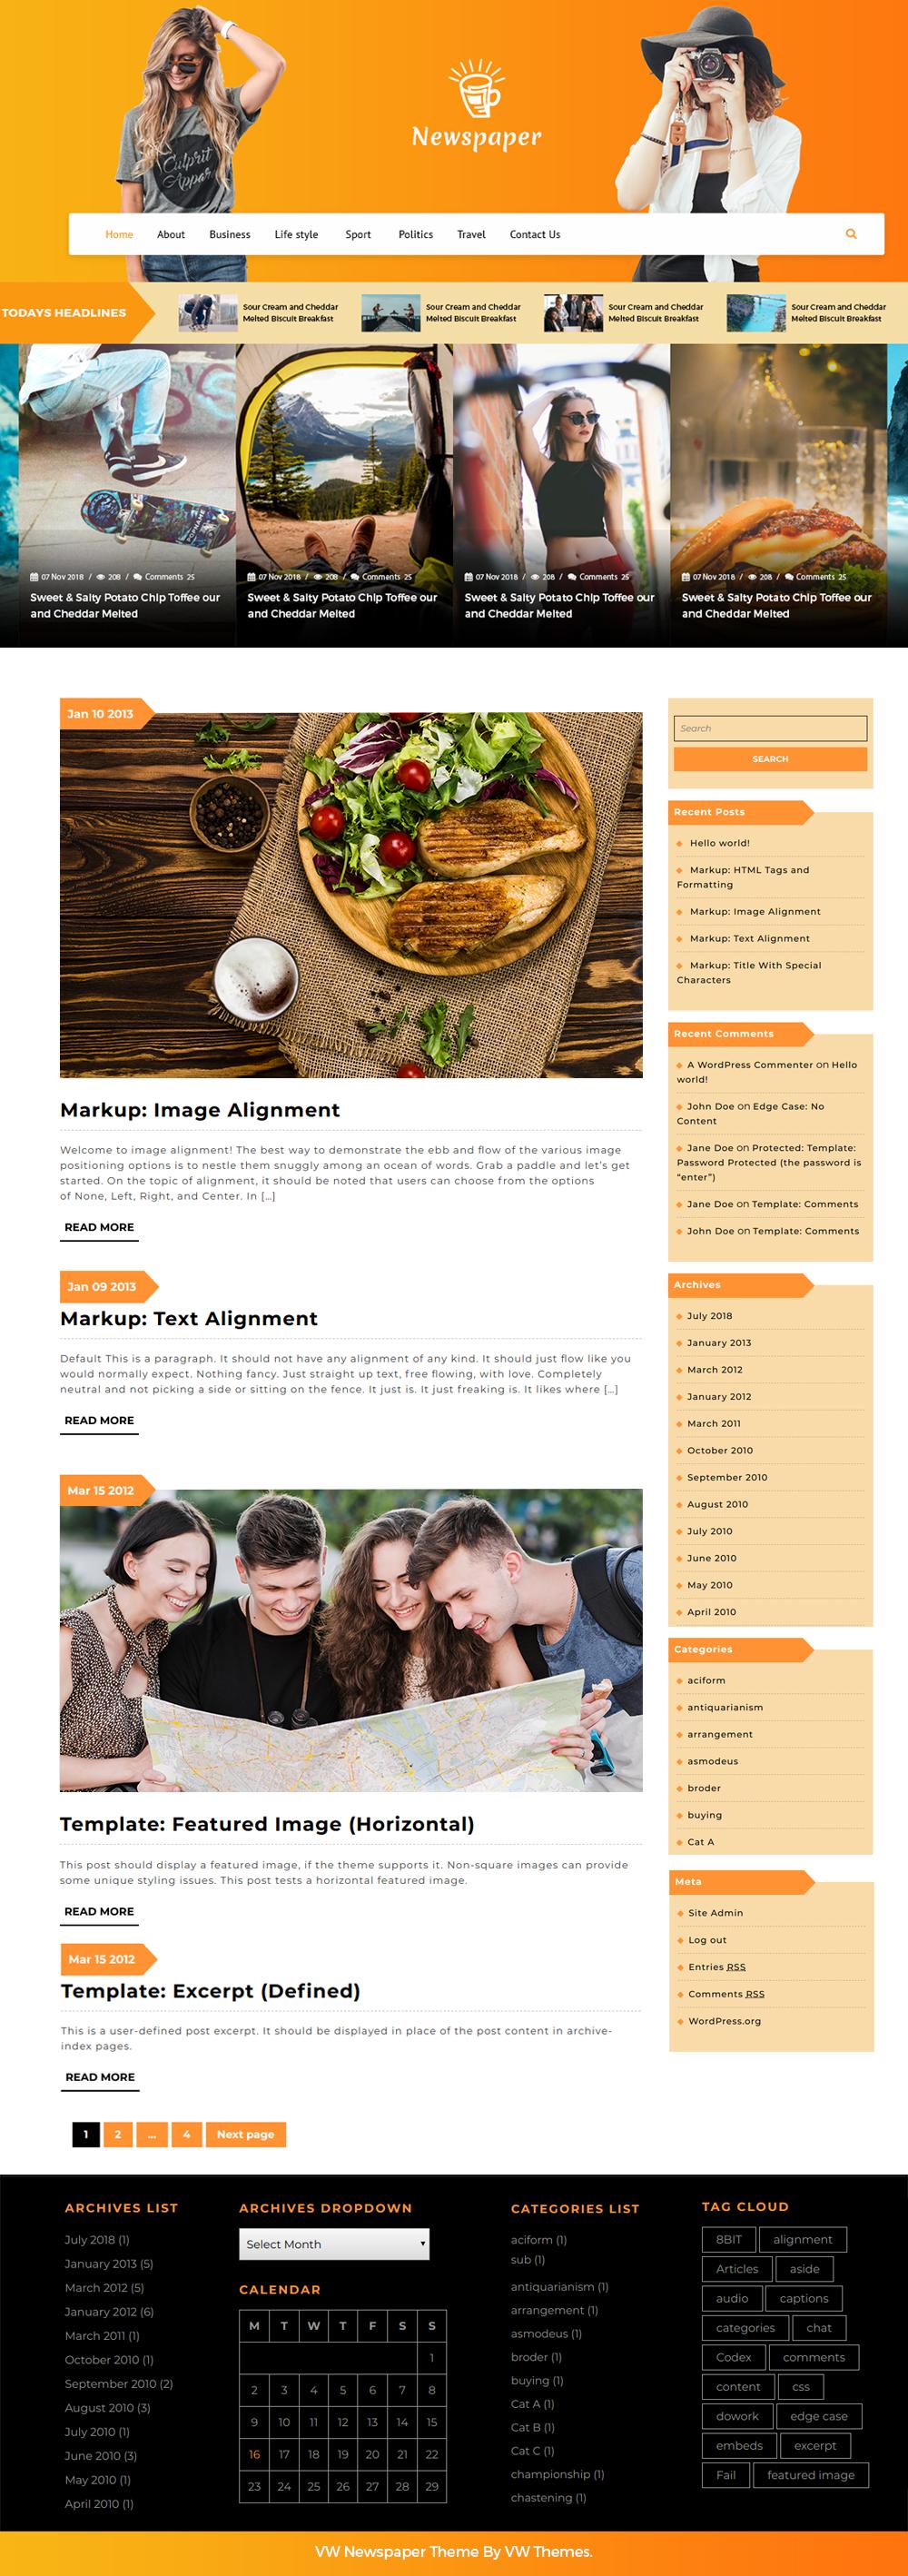 Free Newspaper WordPress Theme